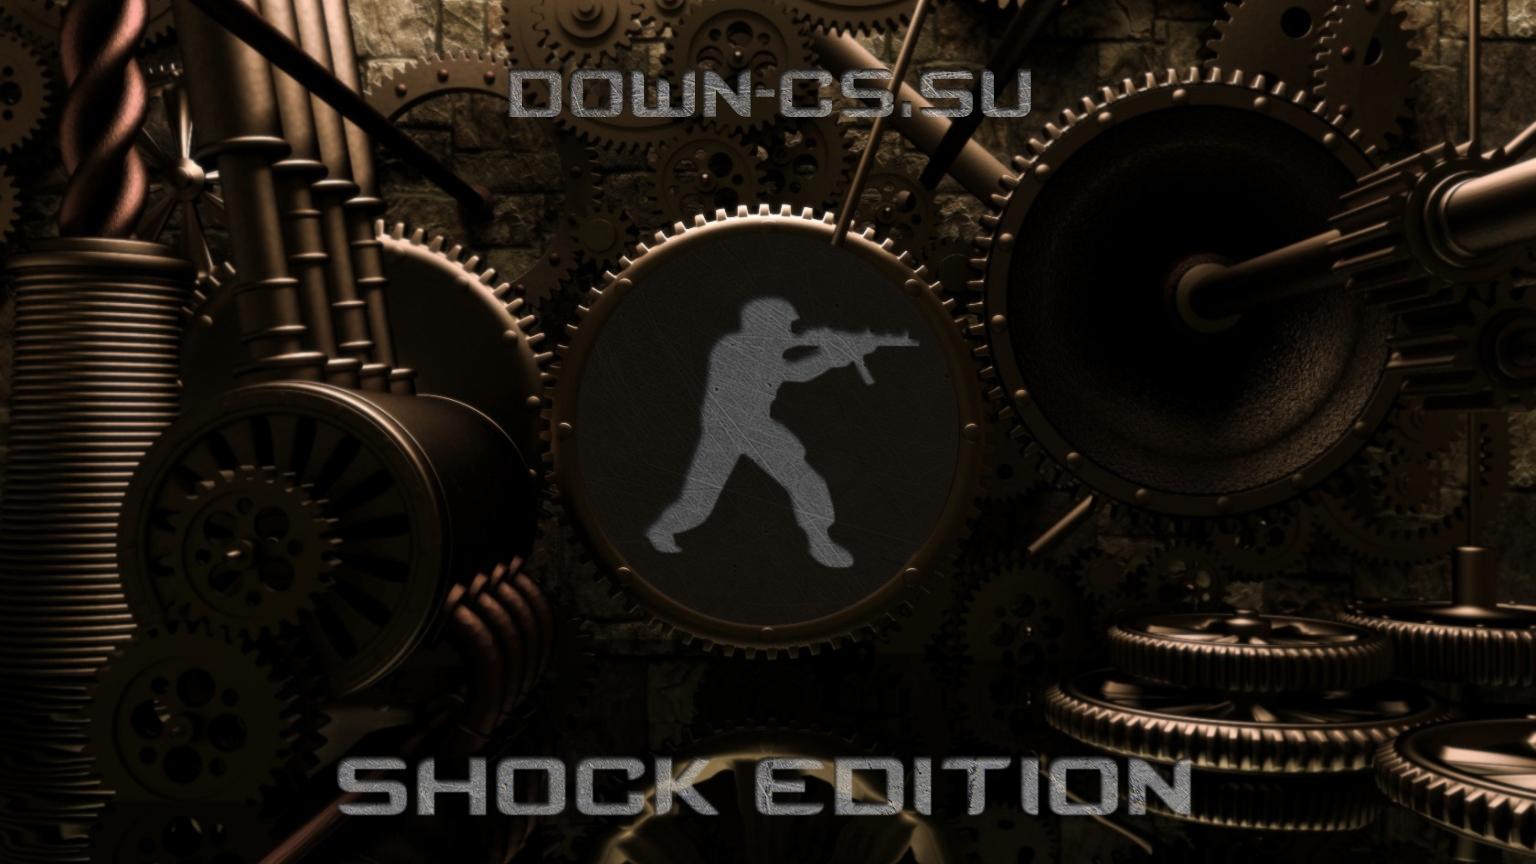 Download CS 1.6 Shock Edition